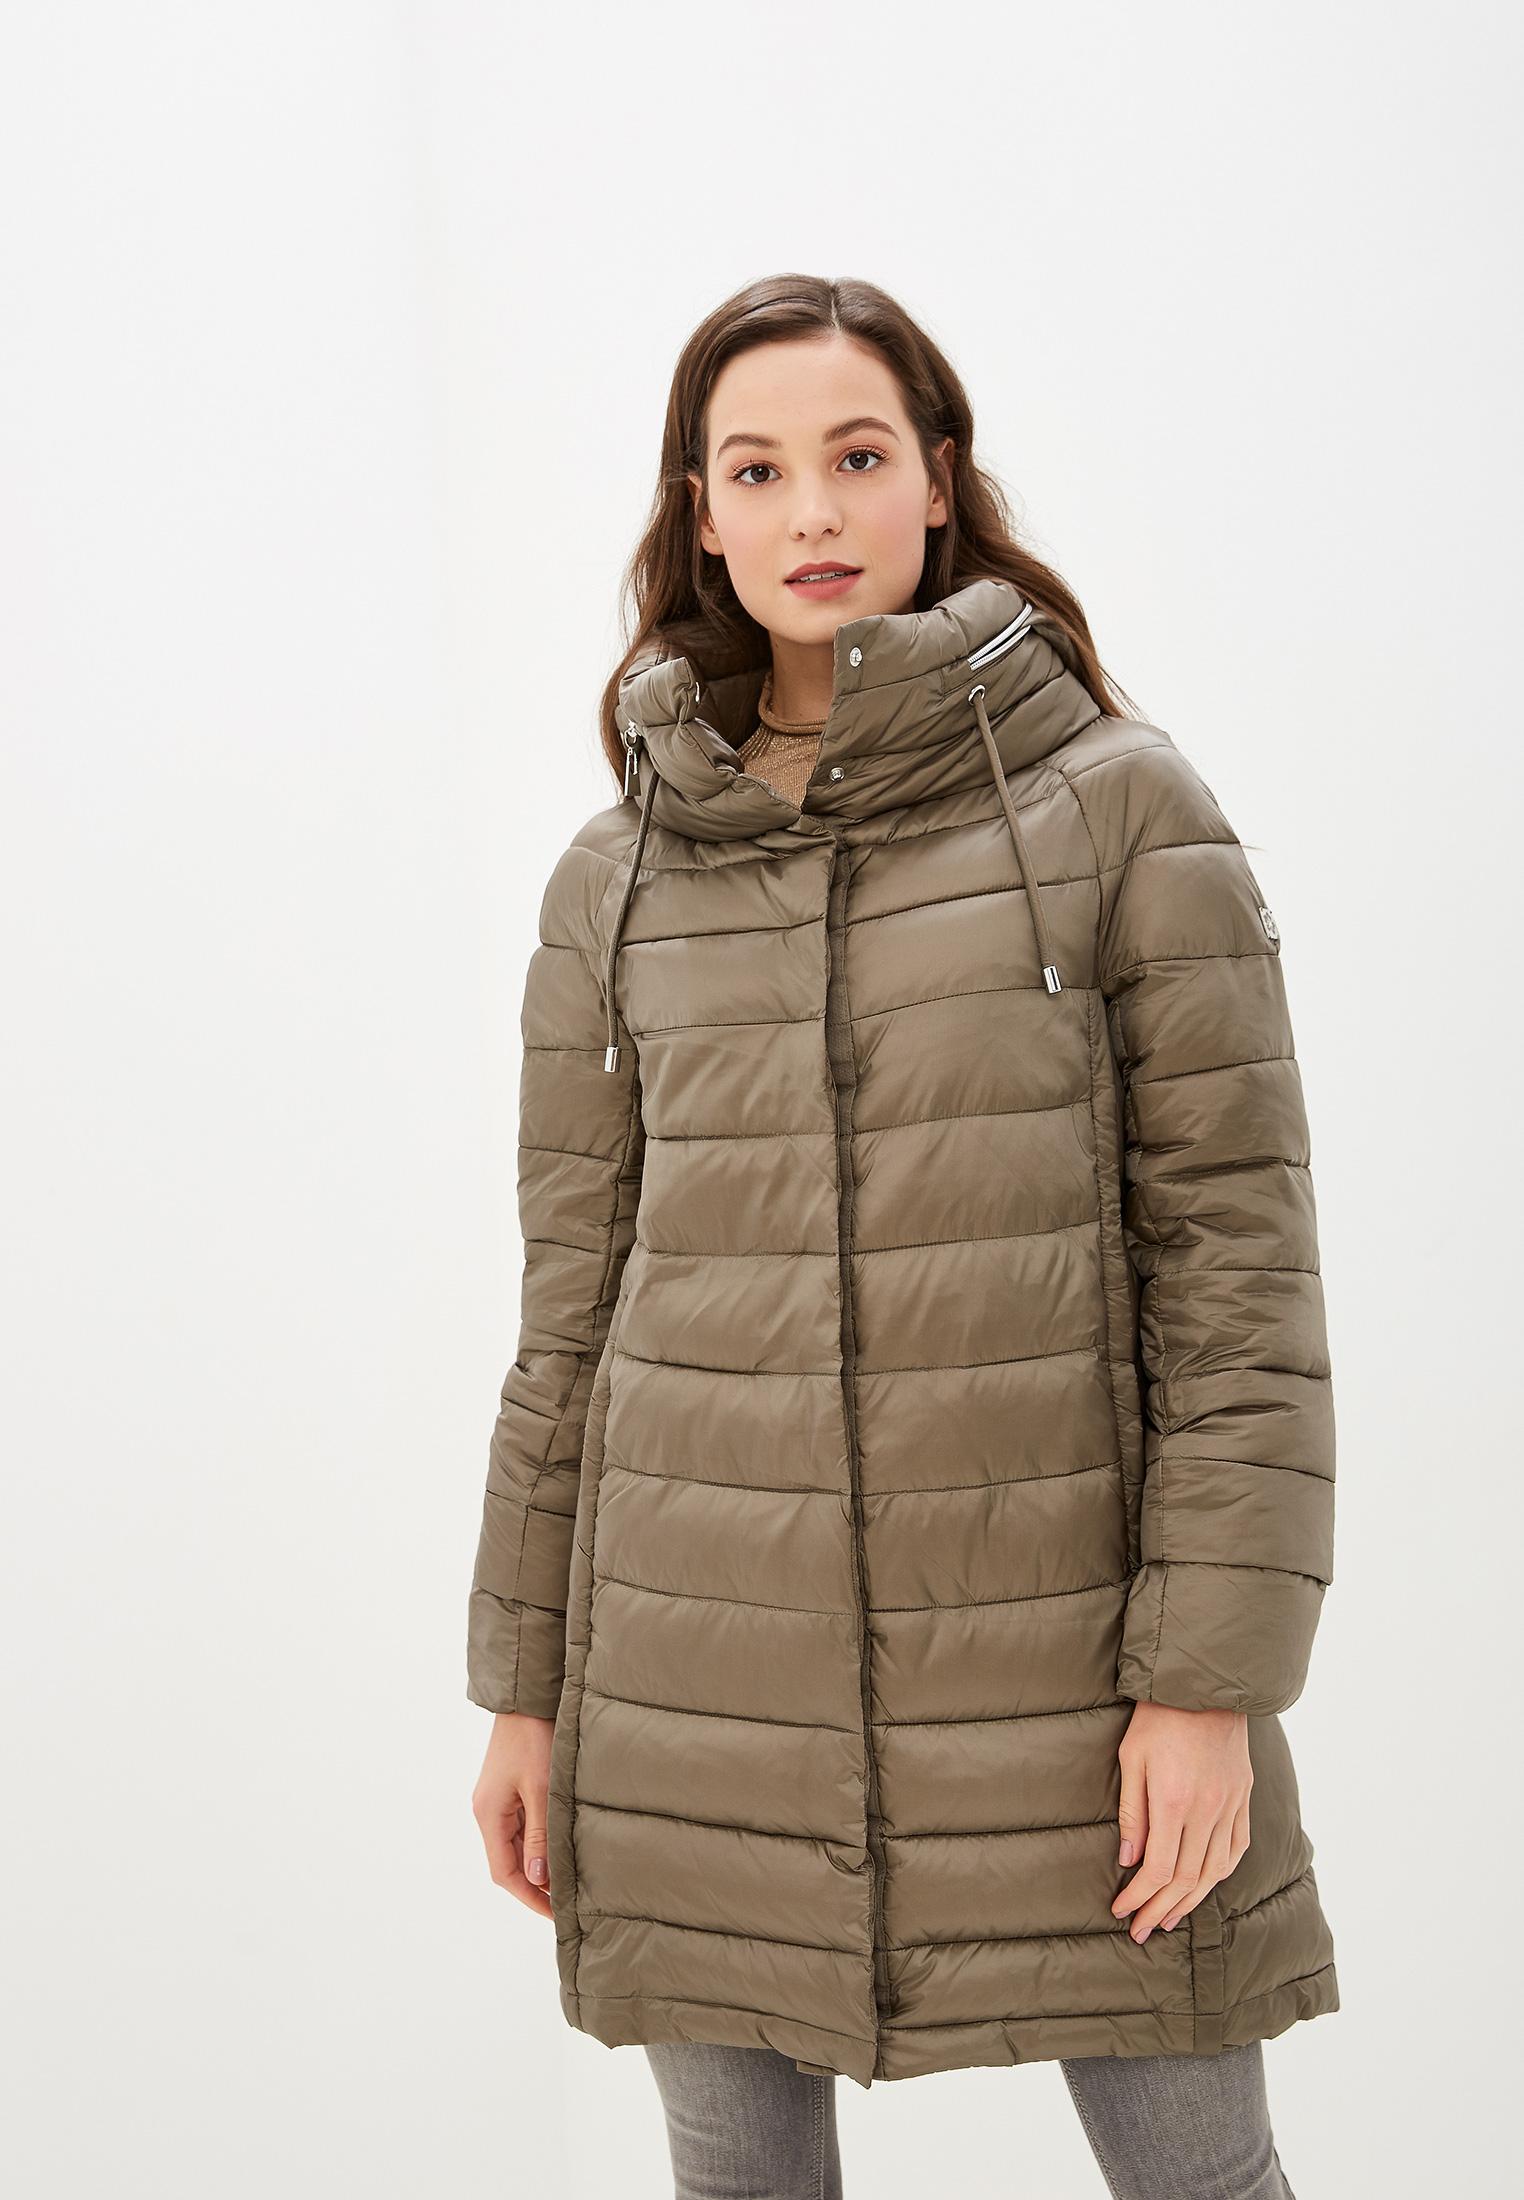 Куртка утепленная, Savage, цвет: хаки. Артикул: SA004EWGESE2. Одежда / Верхняя одежда / Пуховики и зимние куртки